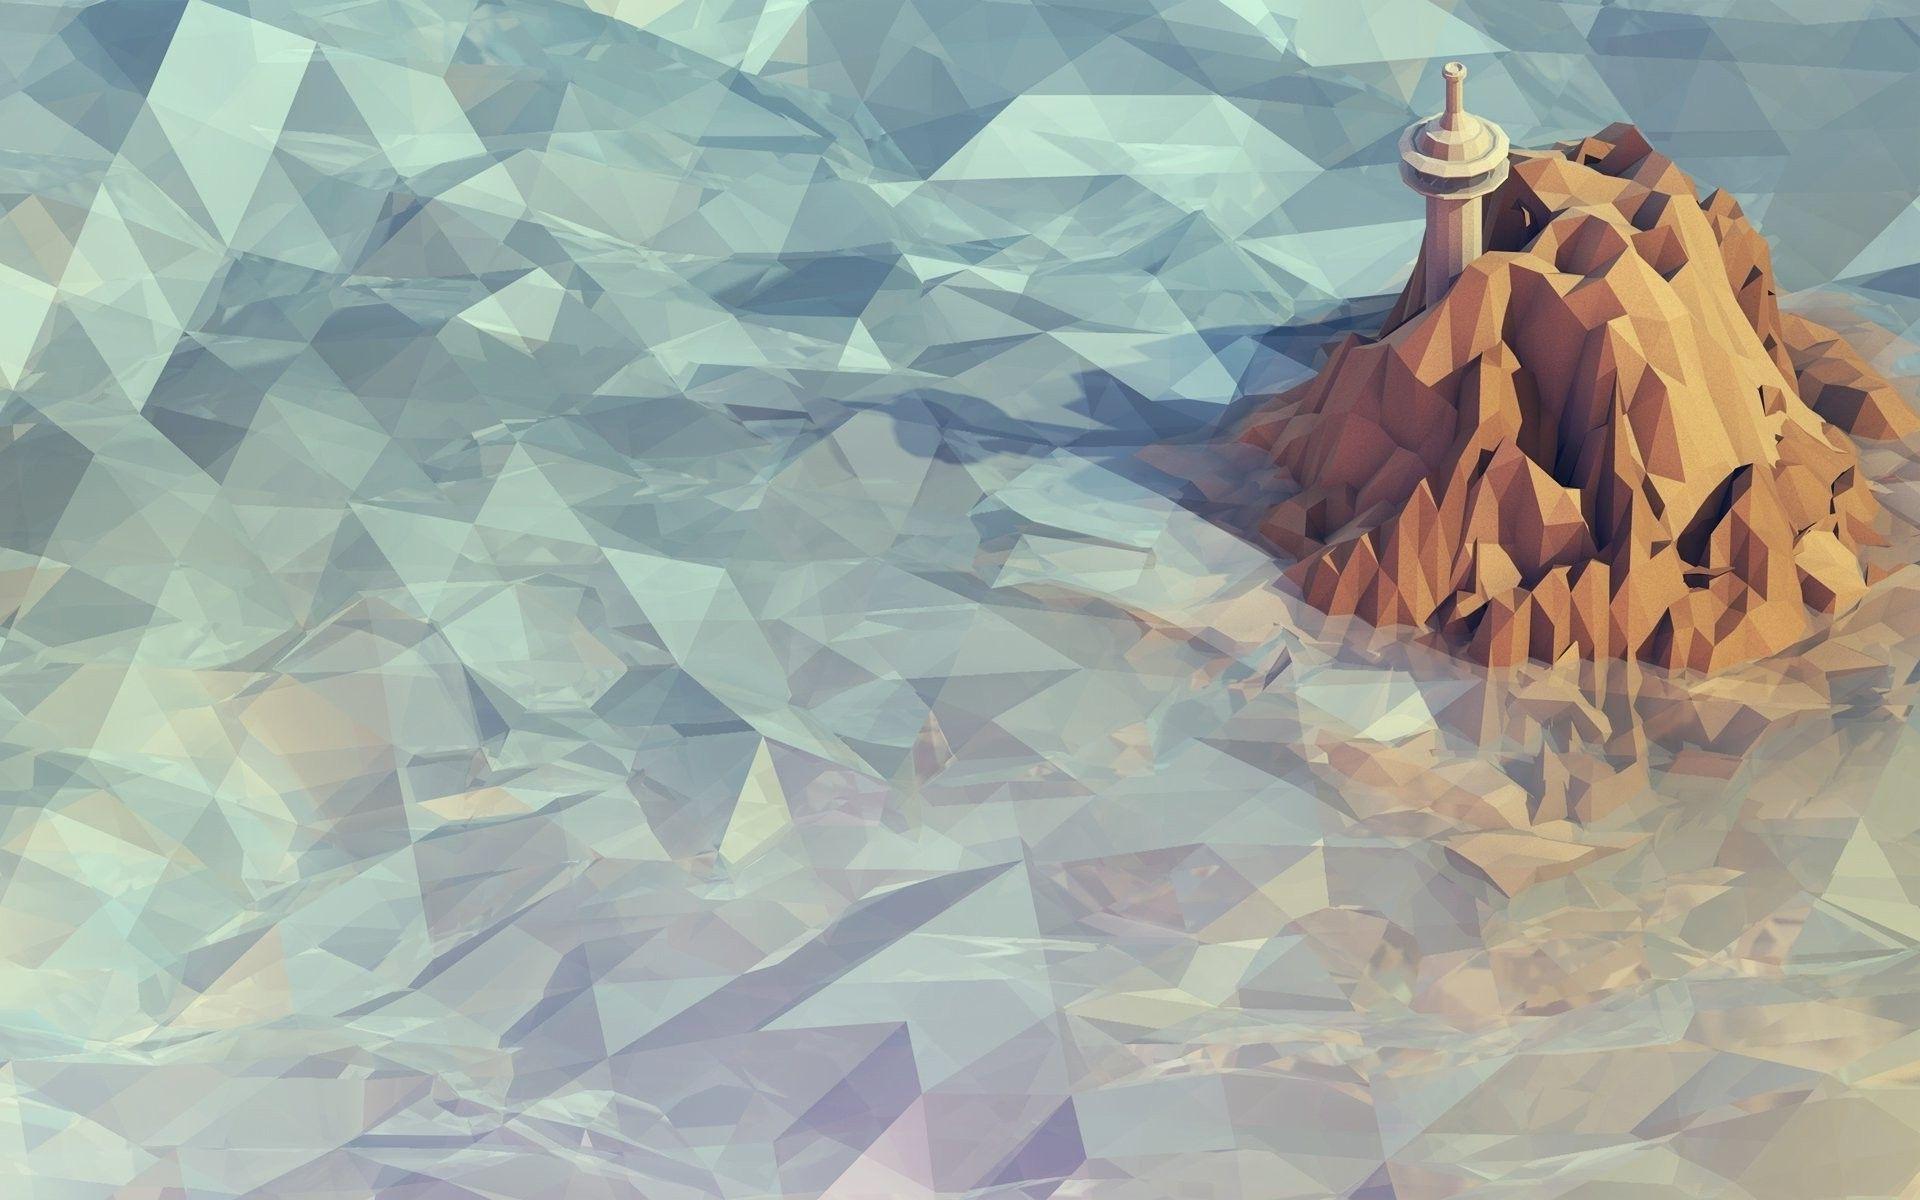 Amazing Wallpaper Mountain Polygon - 3e8d0e896e3f7878b5a3c8a8ef20d942  Image_416452.jpg